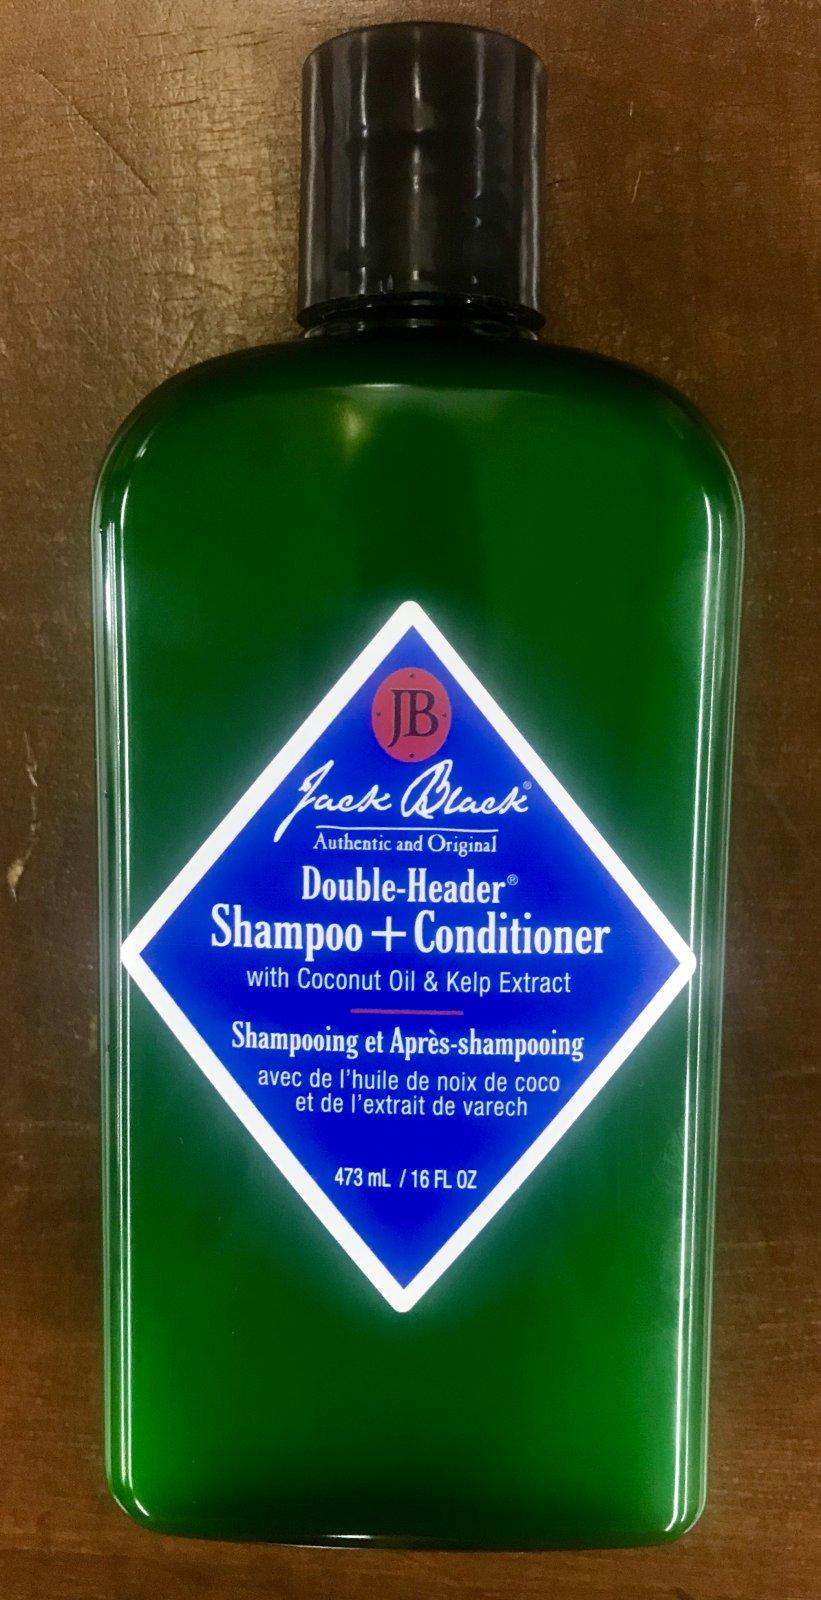 Jack Black Shampoo + Conditioner